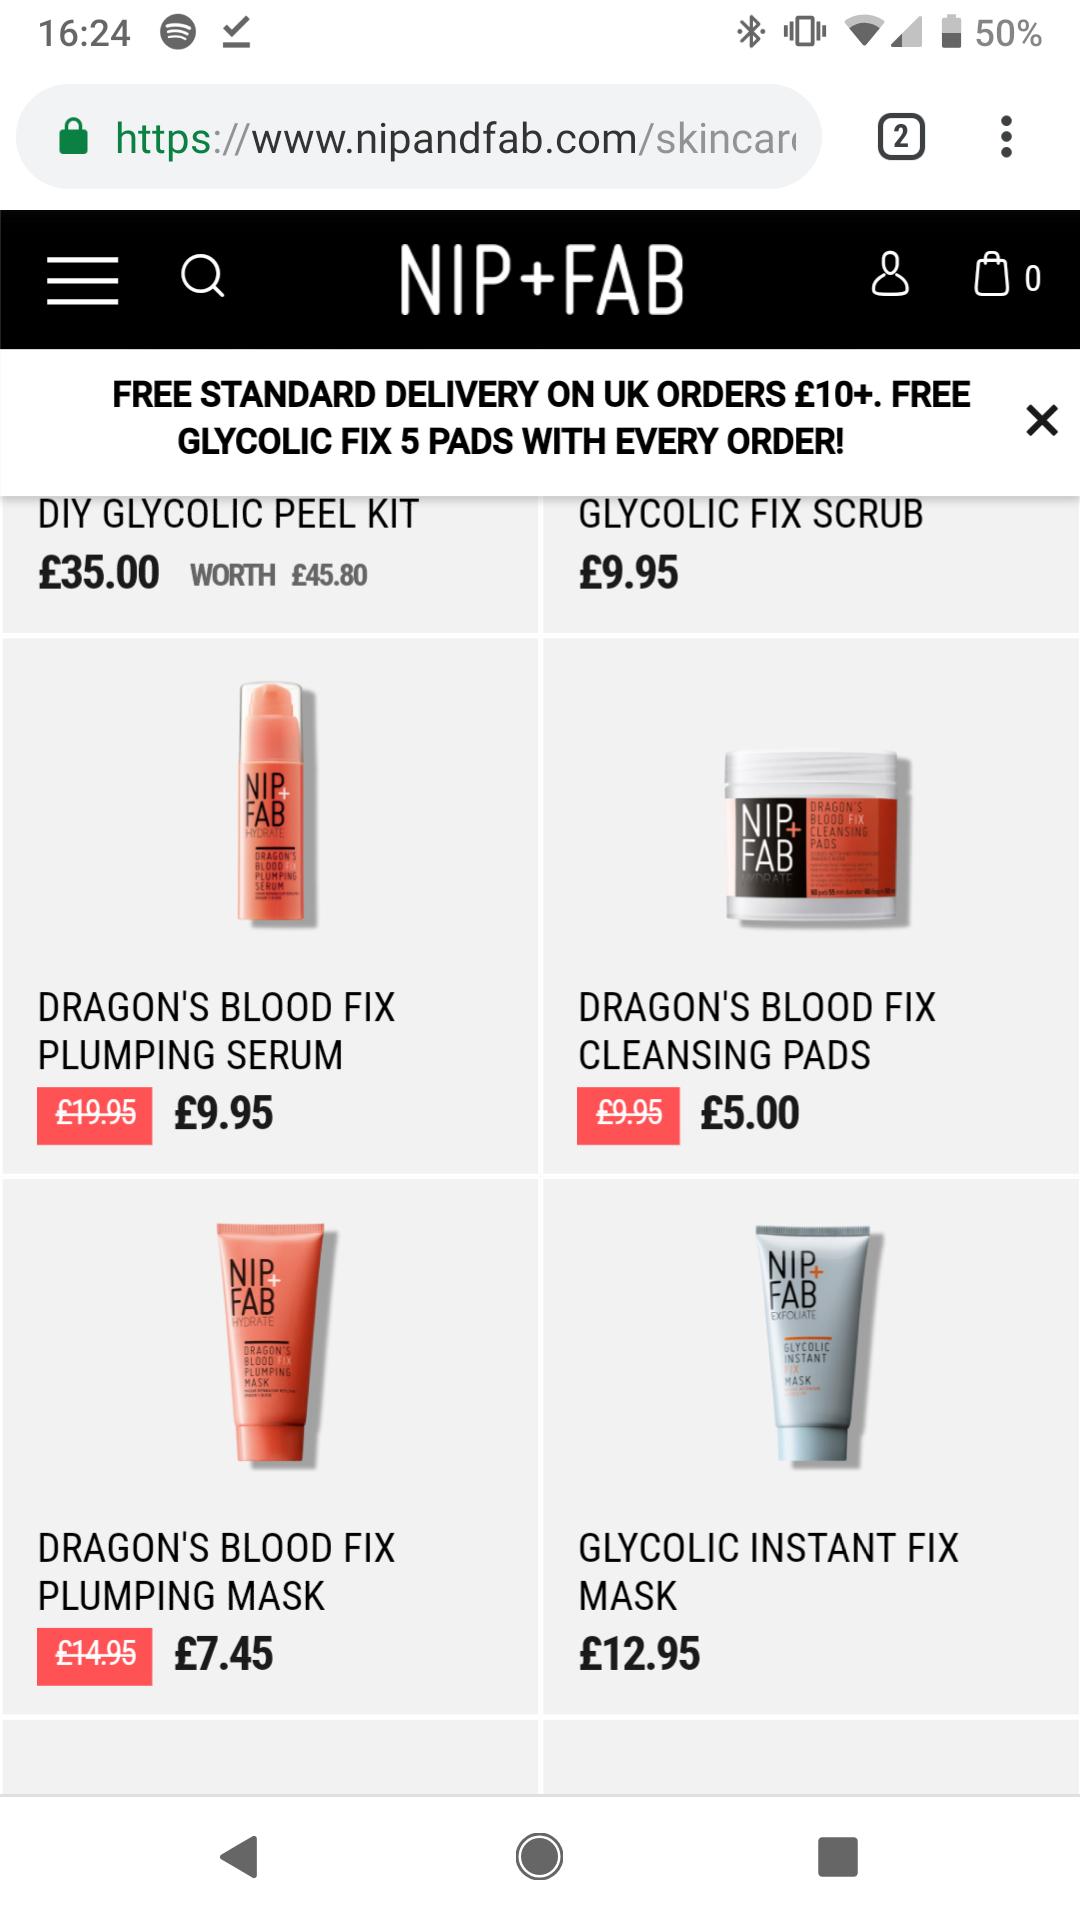 Nip Fab Sale e.g dragon's blood fix plumping serum £19.95 was now £9.95 free shipping on UK orders £10+